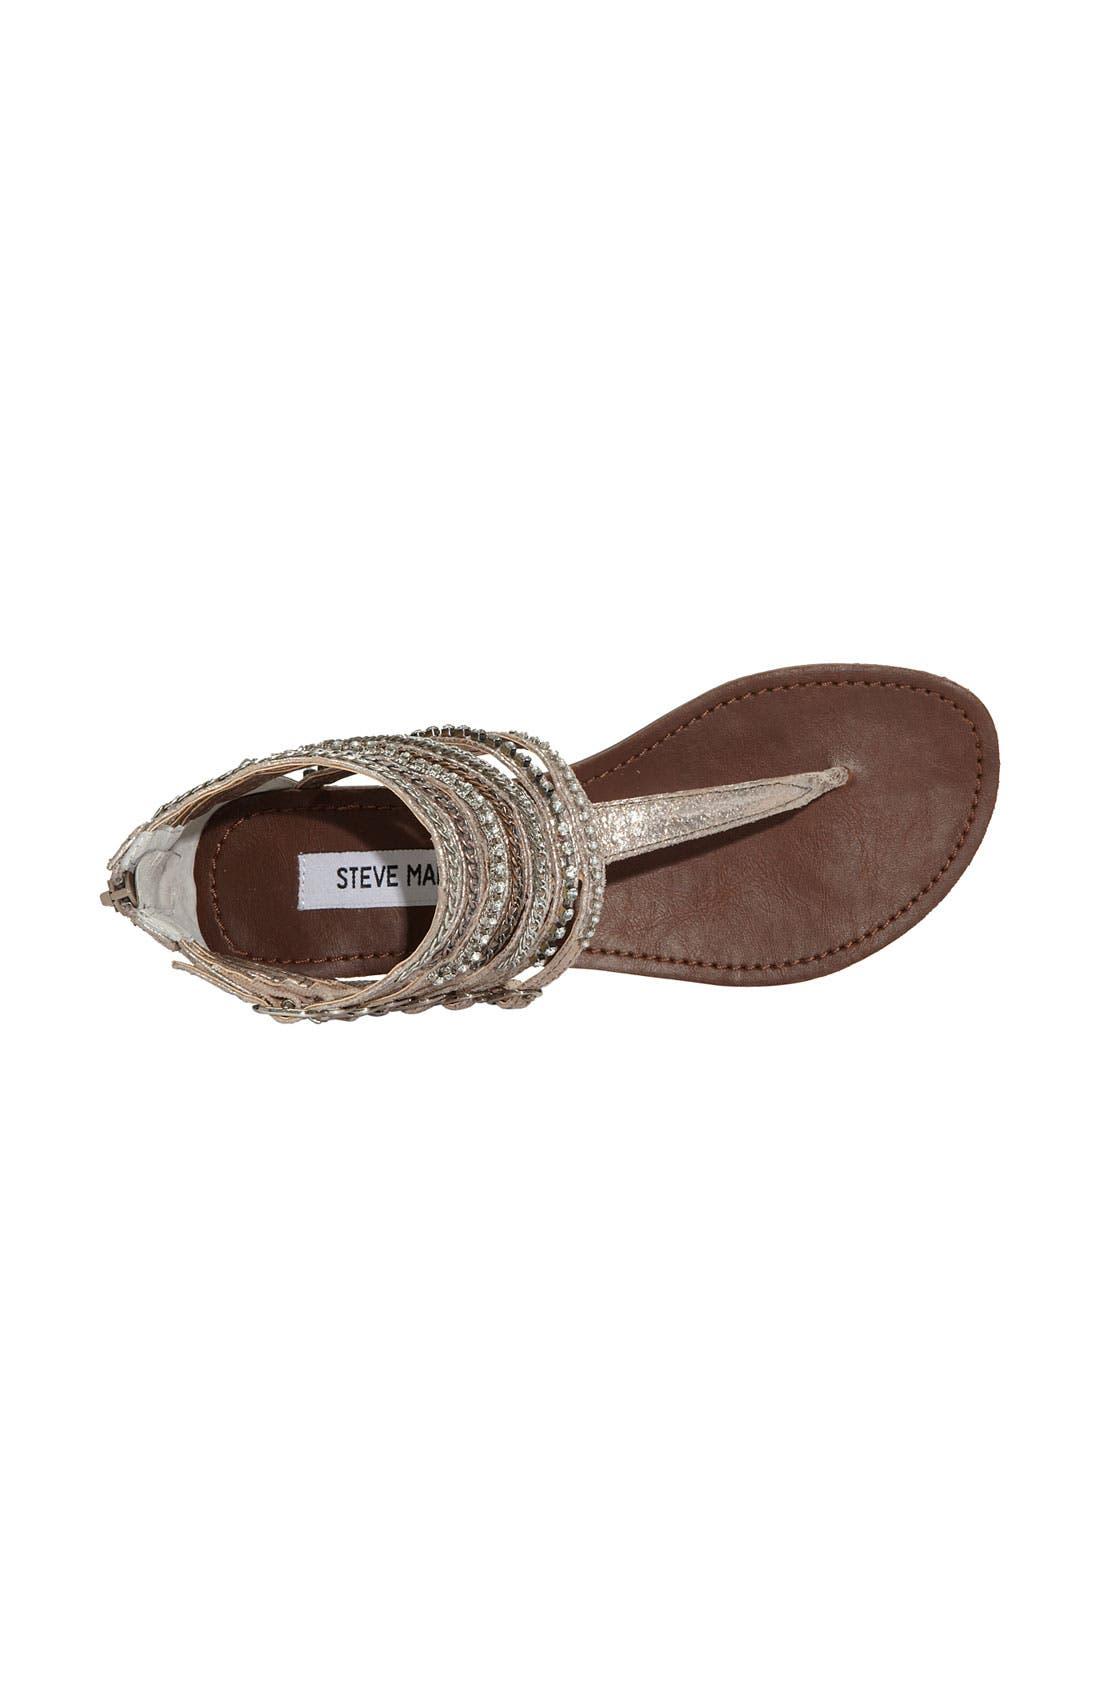 Alternate Image 3  - Steve Madden 'Simple' Leather Sandal